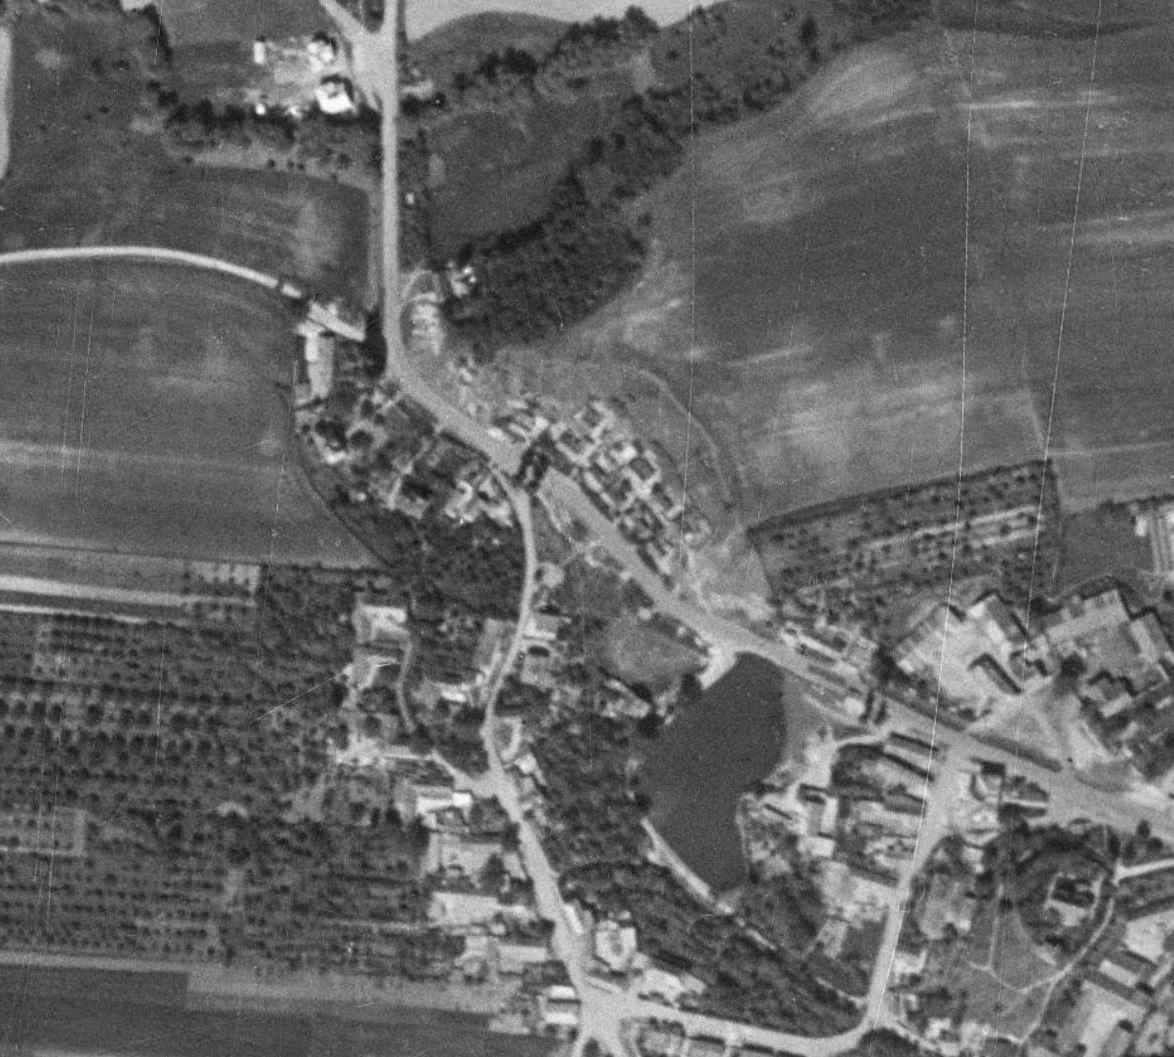 nouzova-kolonie-pod-zameckem-letecky-snimek-1953